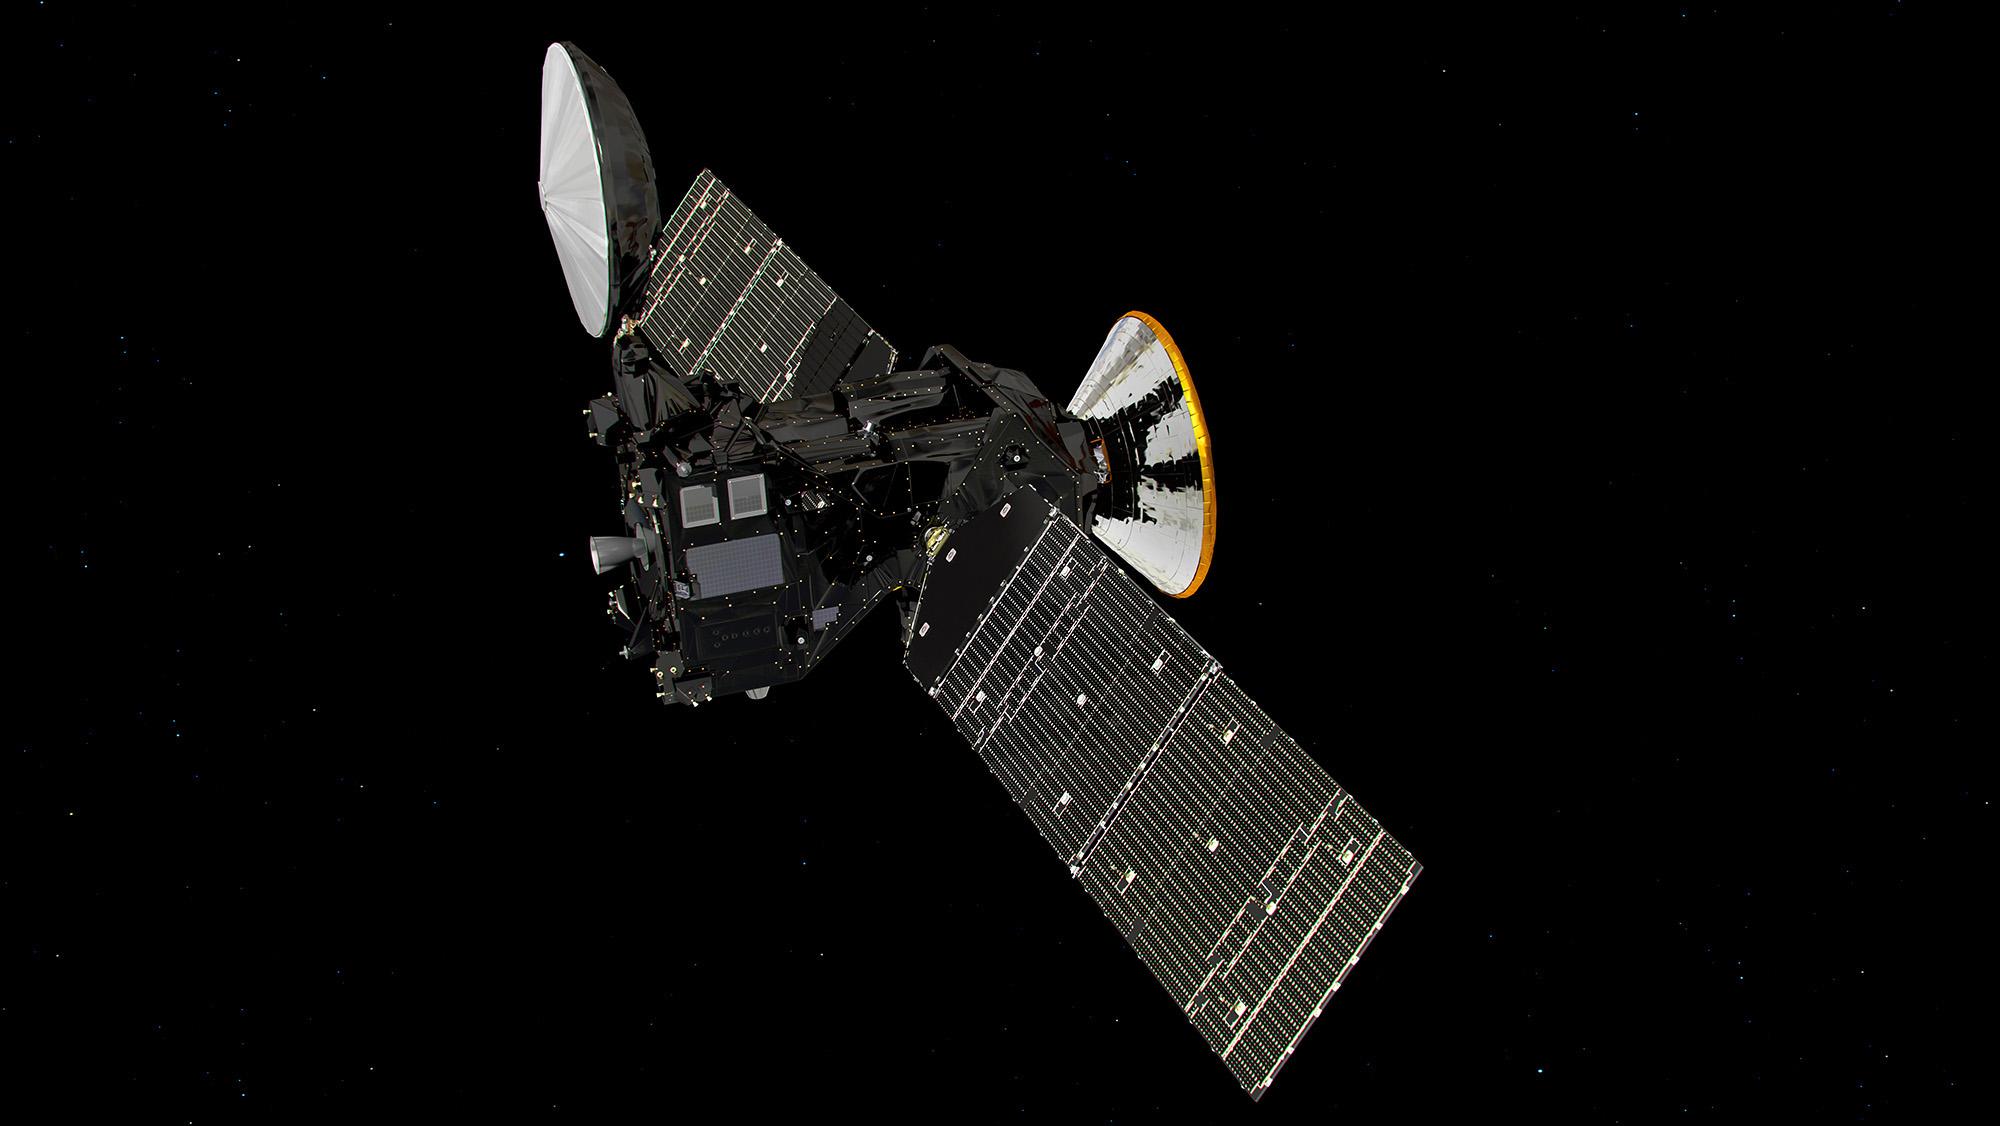 European Mars Probe Performs 1st Crucial Deep-Space Maneuver